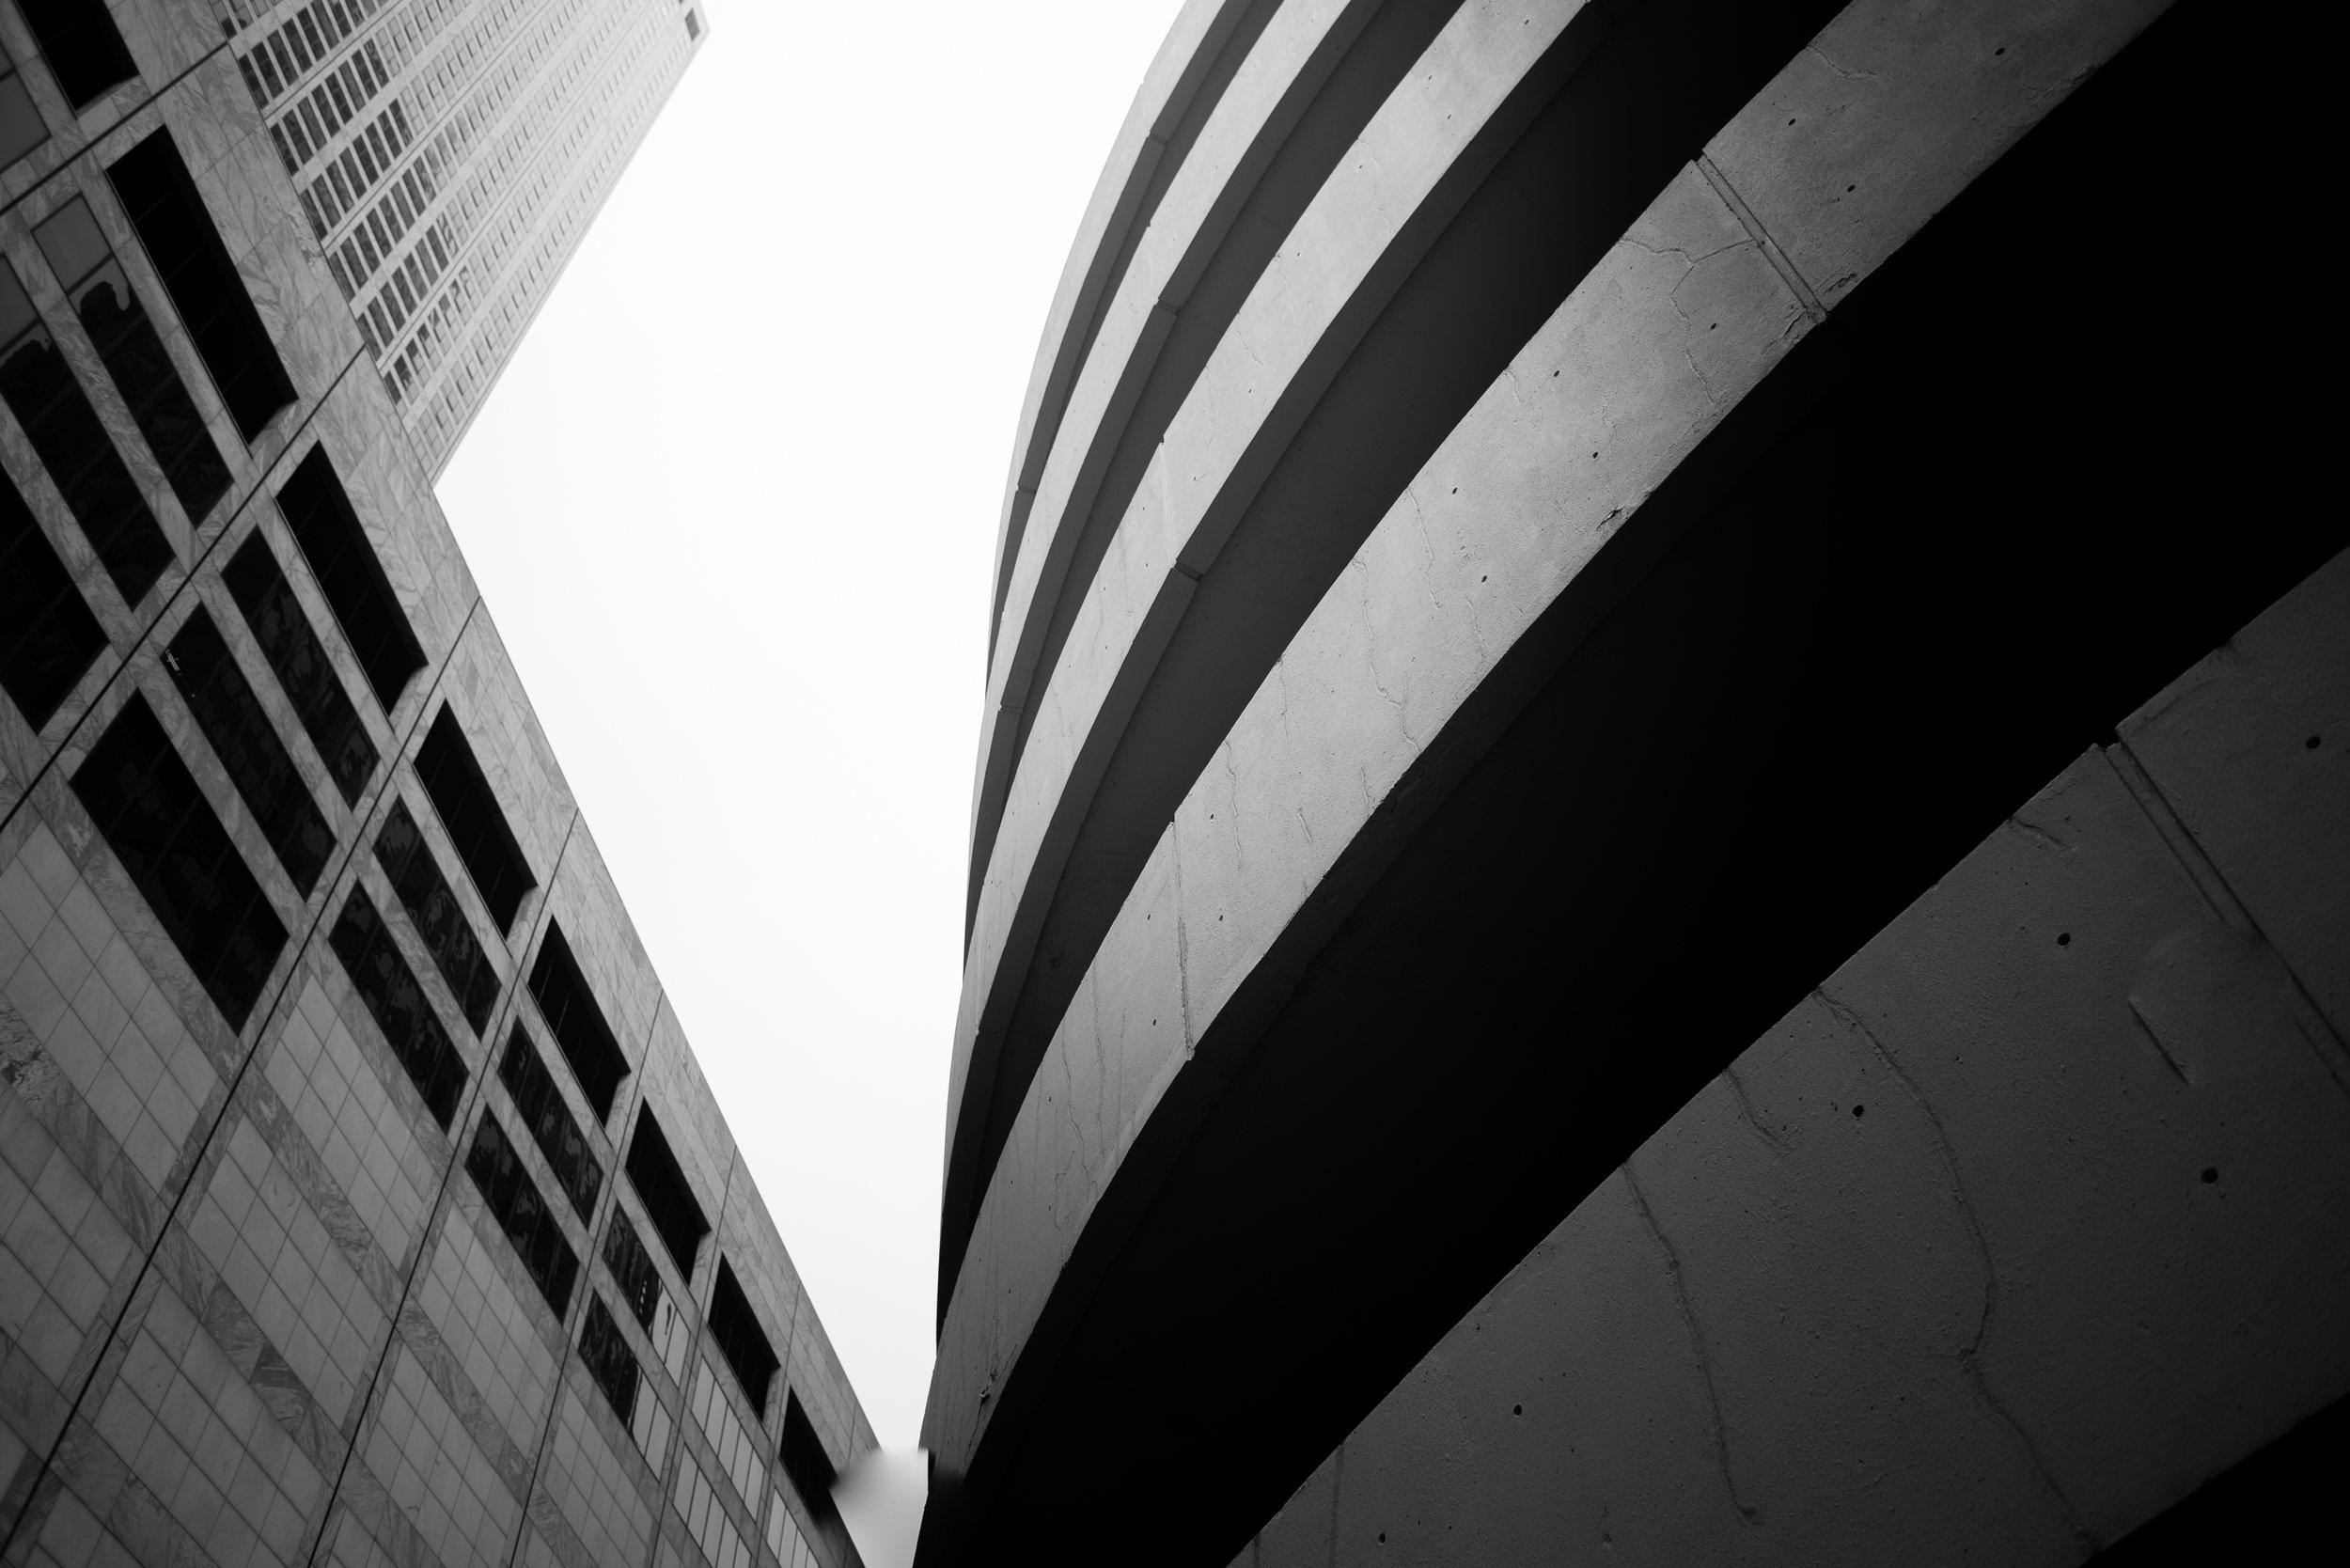 David-Olivier-Gascon-photography-chicago-studiod-montreal--07674.jpg